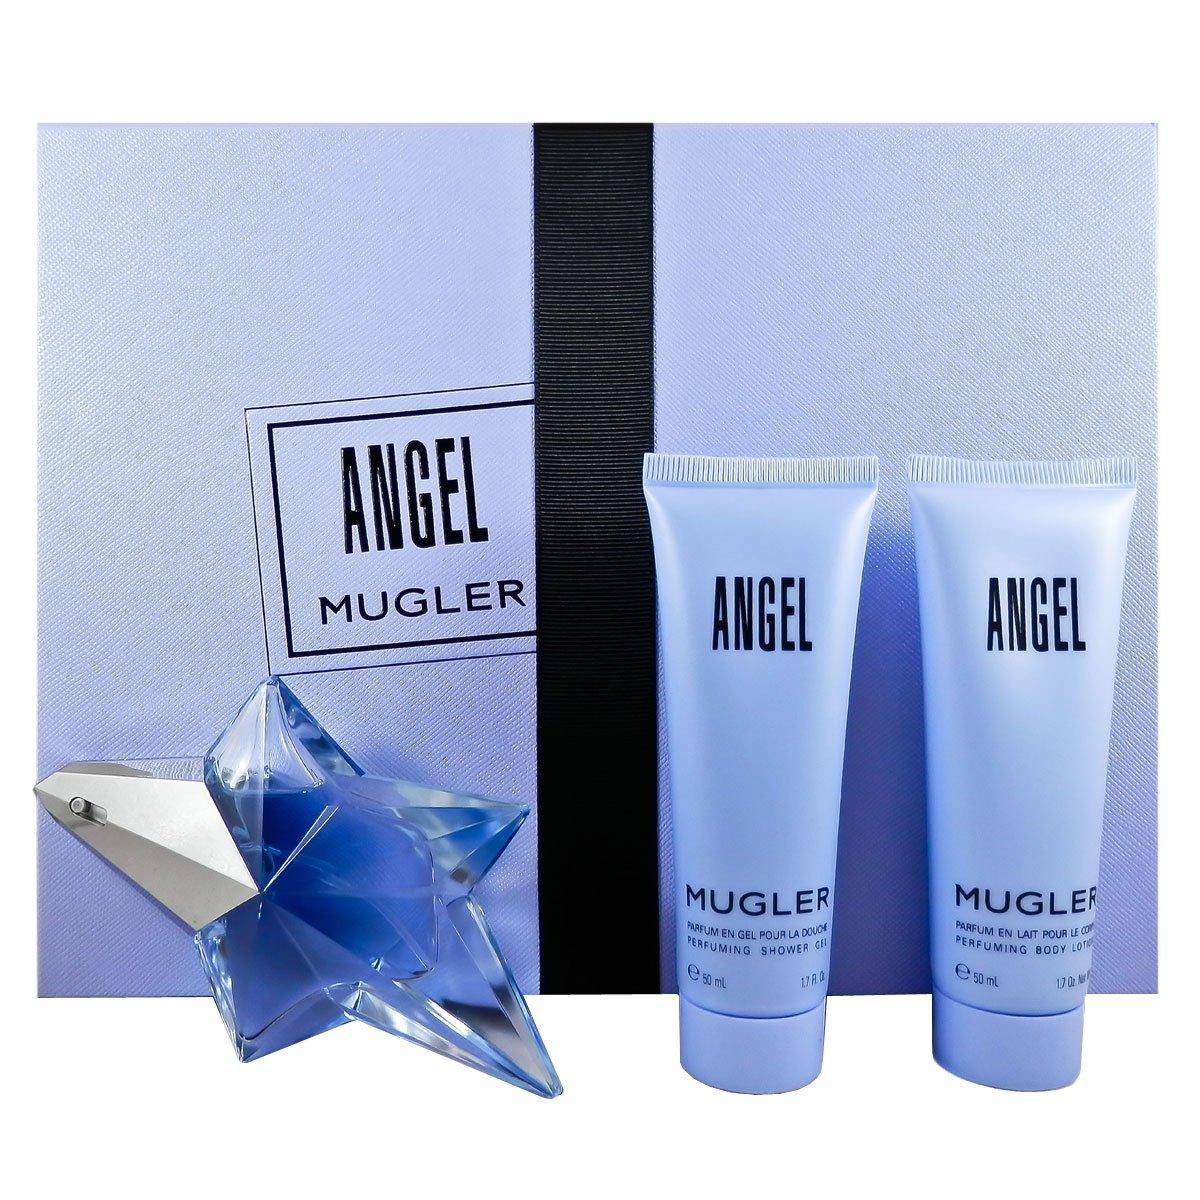 Thierry Mugler 3 Piece Refillable Angel Gift Set Eau de Parfum Spray for Women by Thierry Mugler (Image #1)